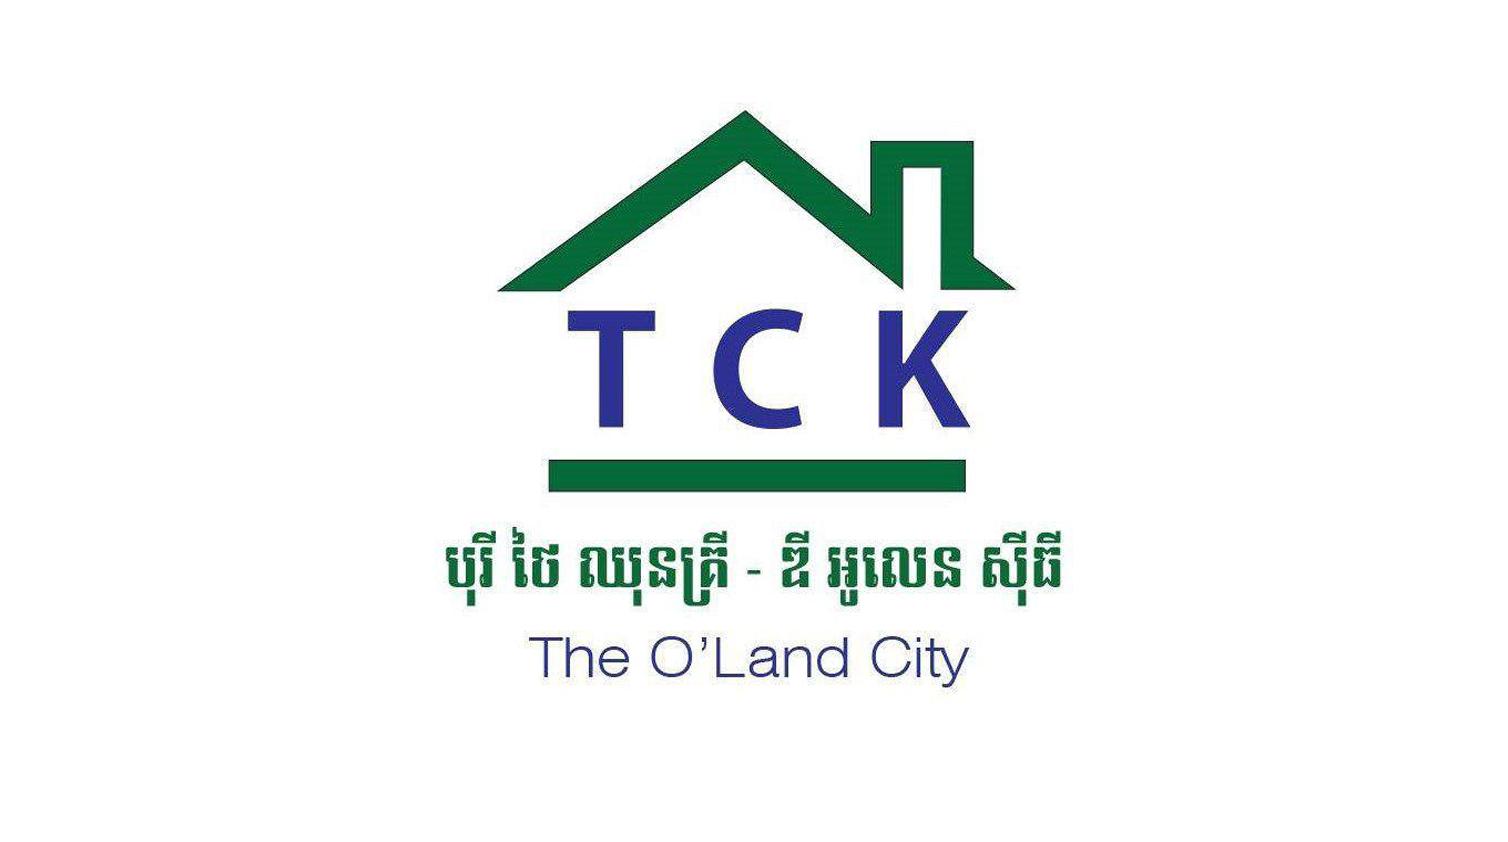 The O'Land city